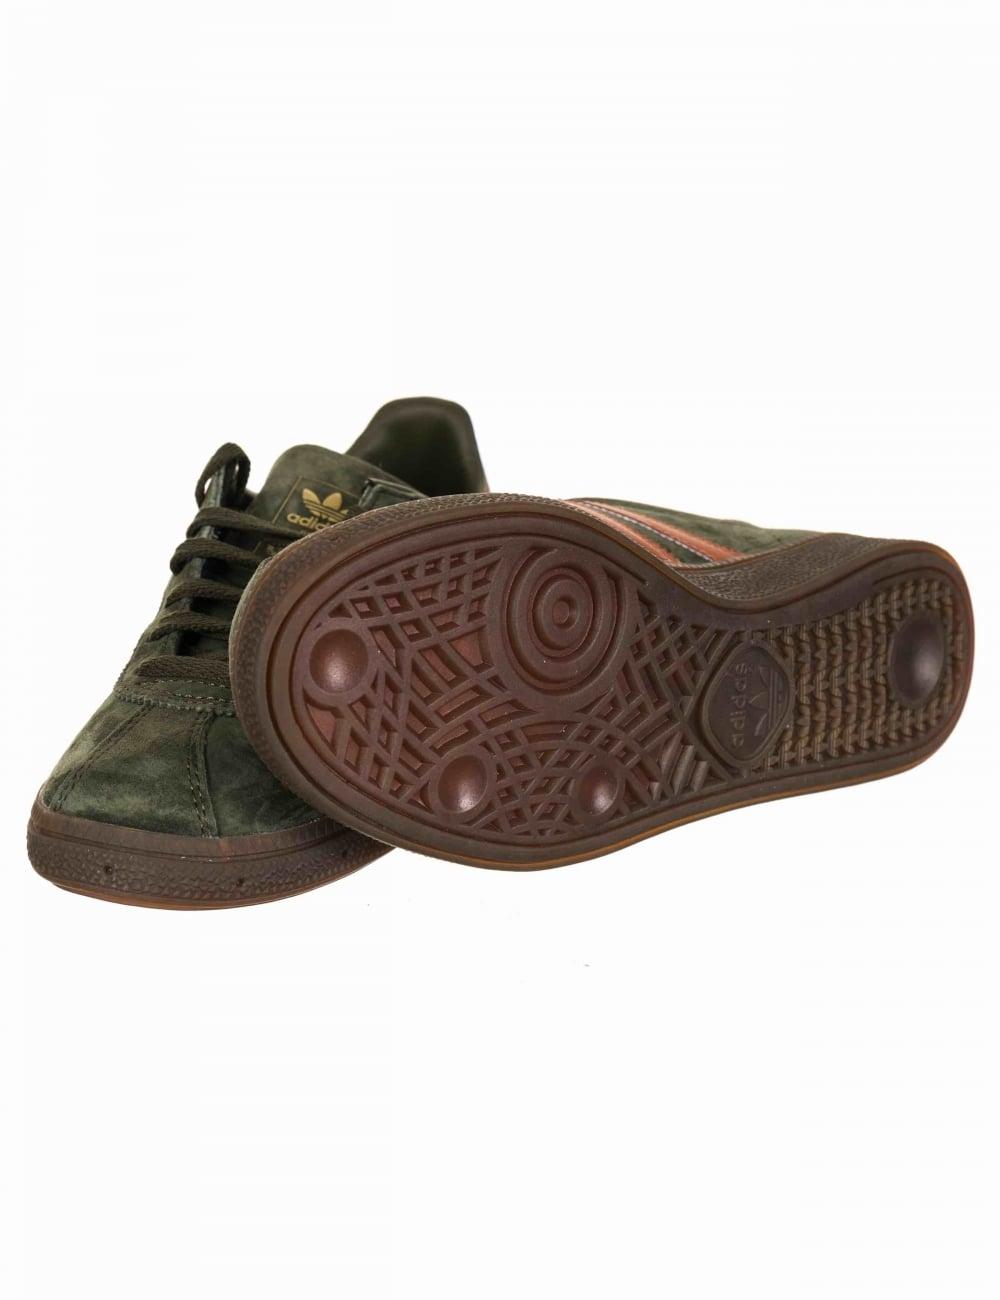 Adidas Originals Munchen Shoes Night CargoBronze